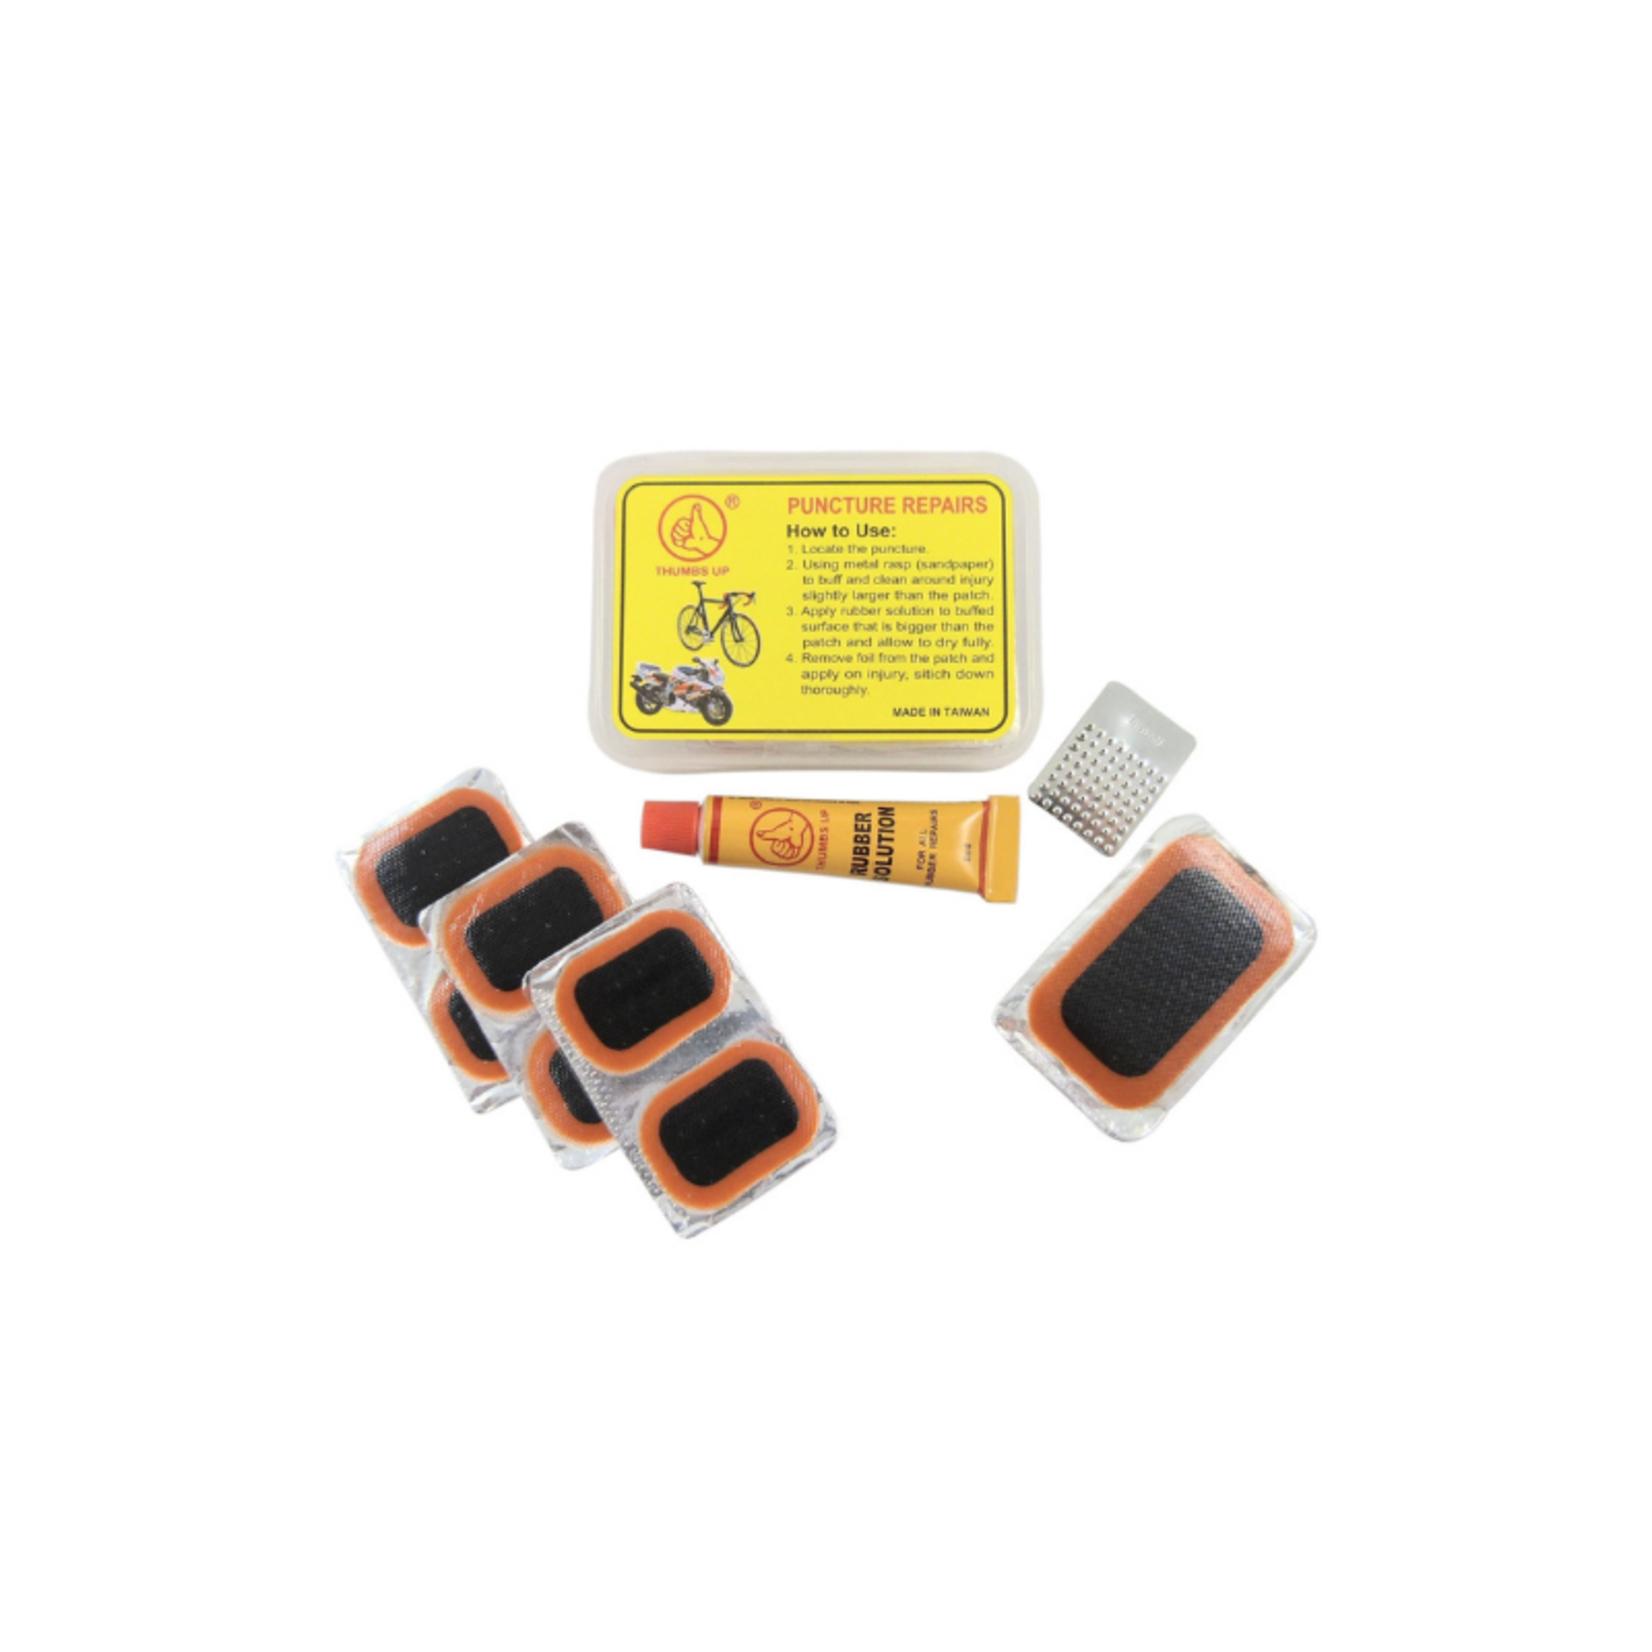 Thumbs Up Puncture Repair Kit